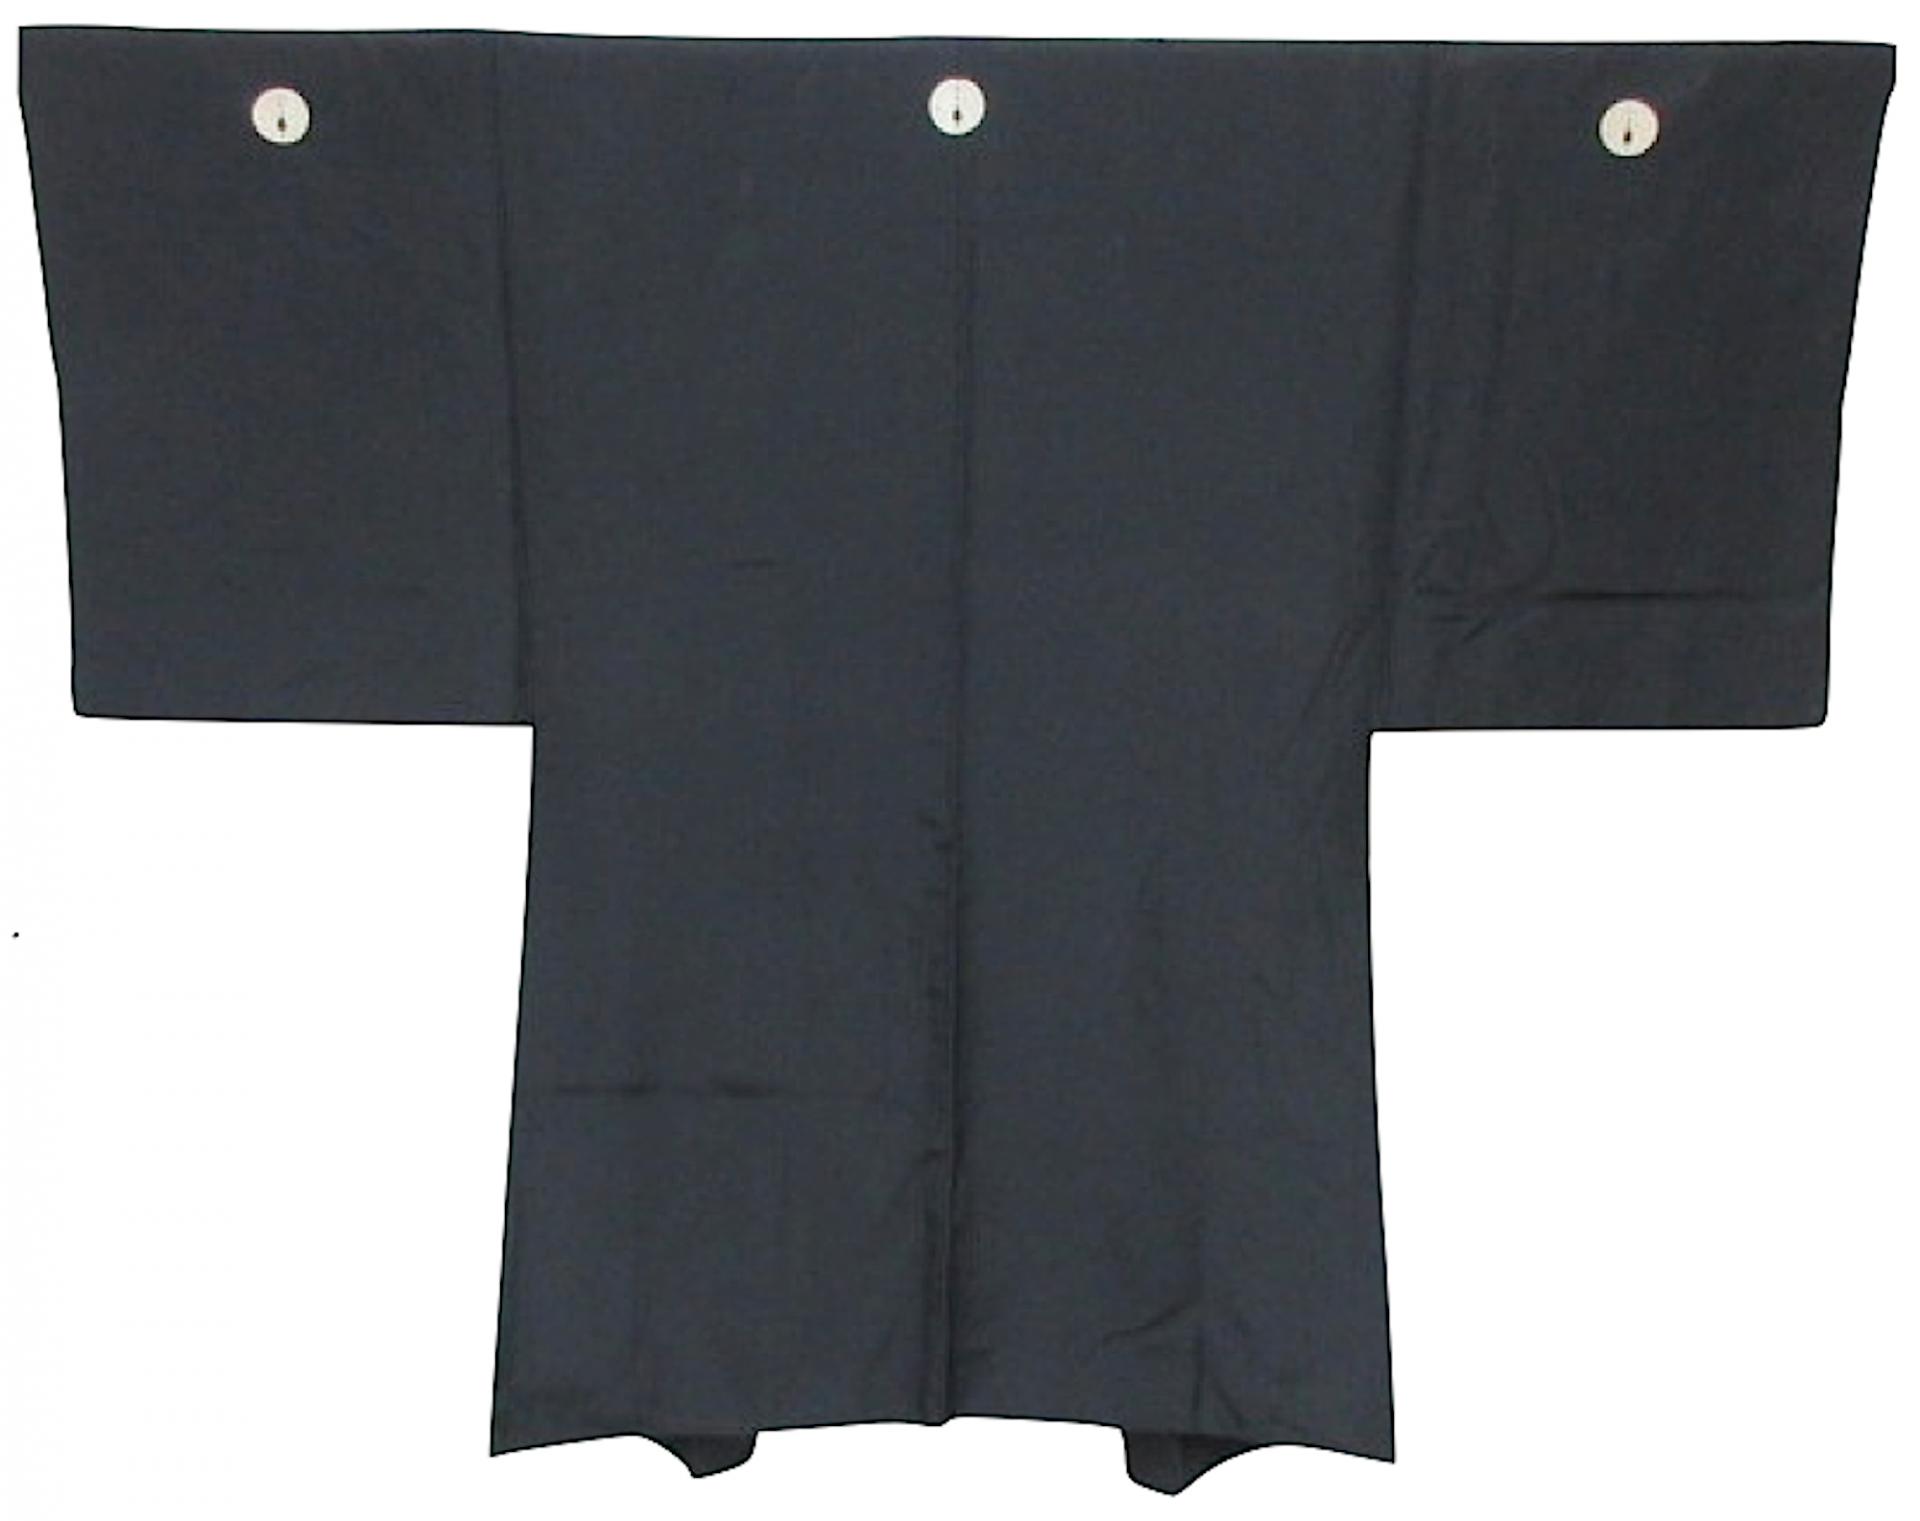 Antique haori samourai meoto iwa ise maruni dakimy 1